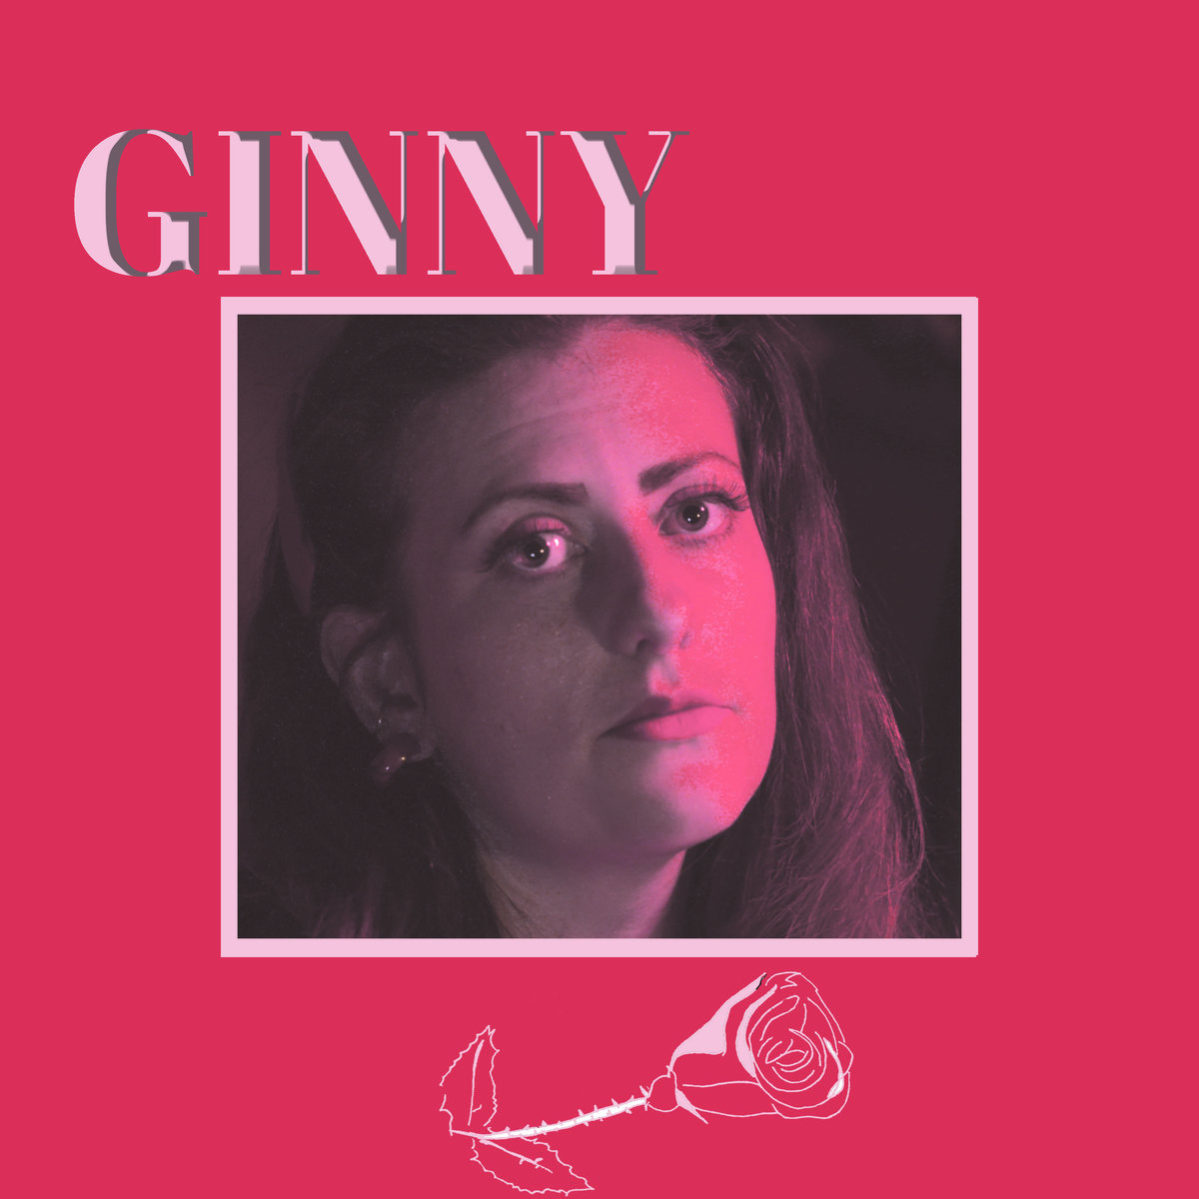 ginny-band